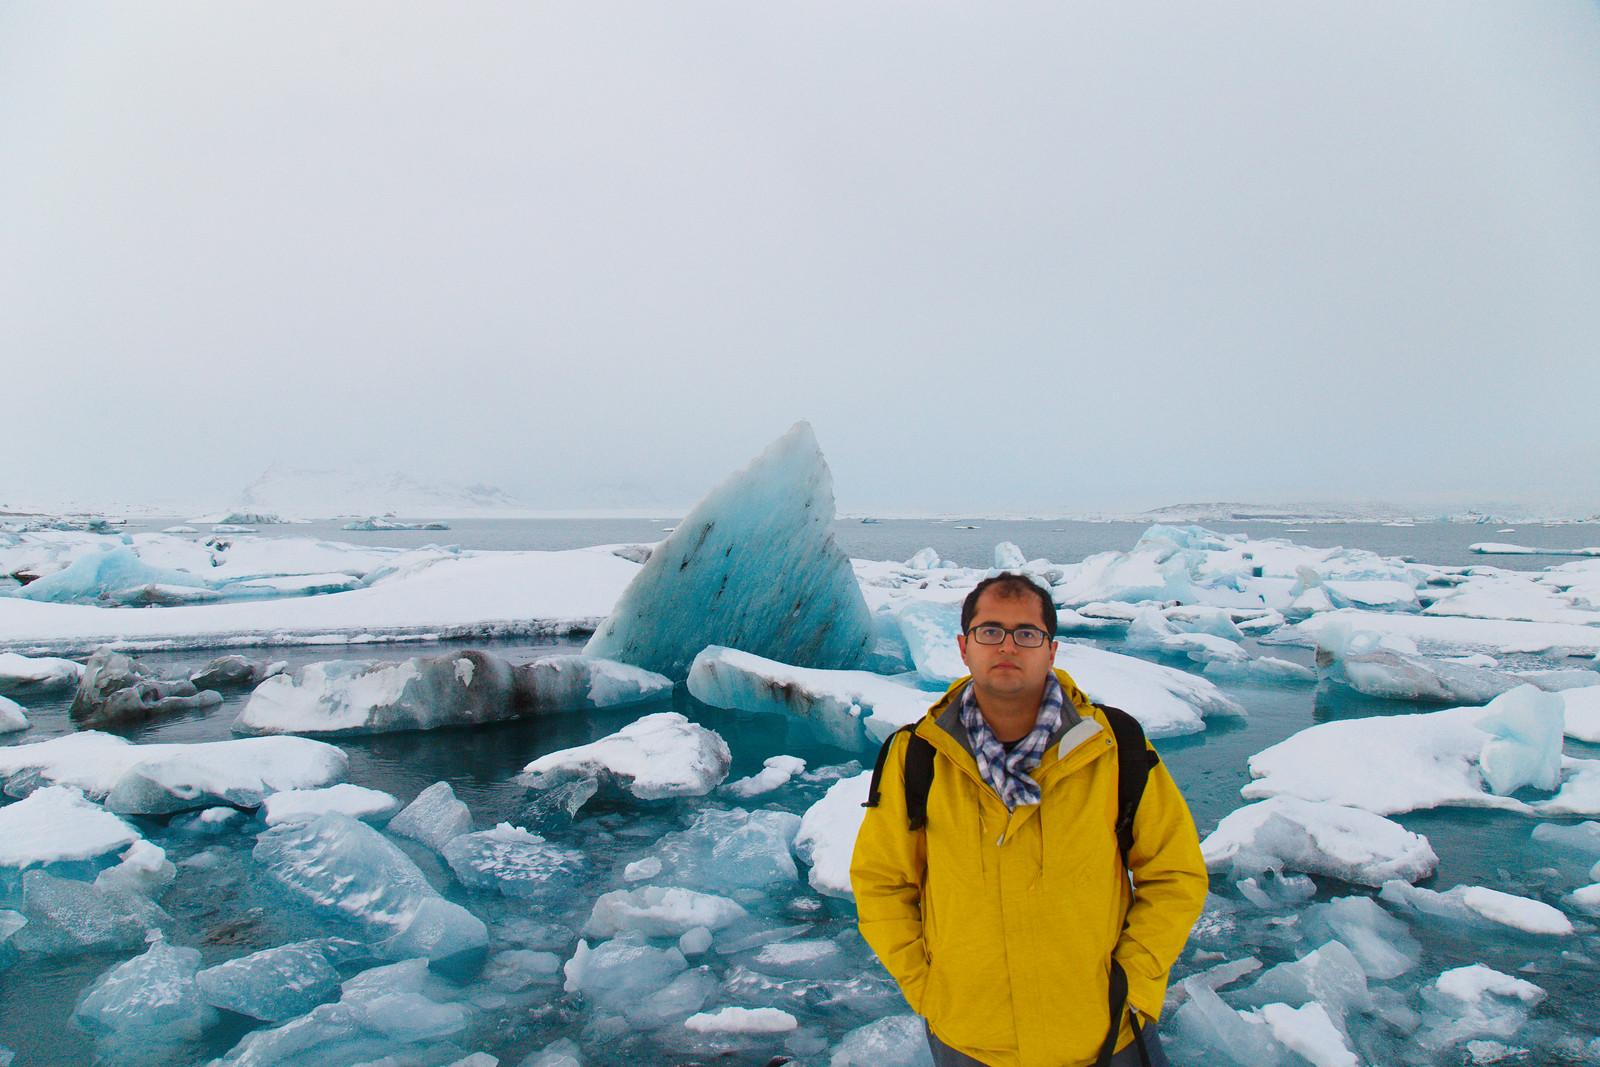 Icebergs & me